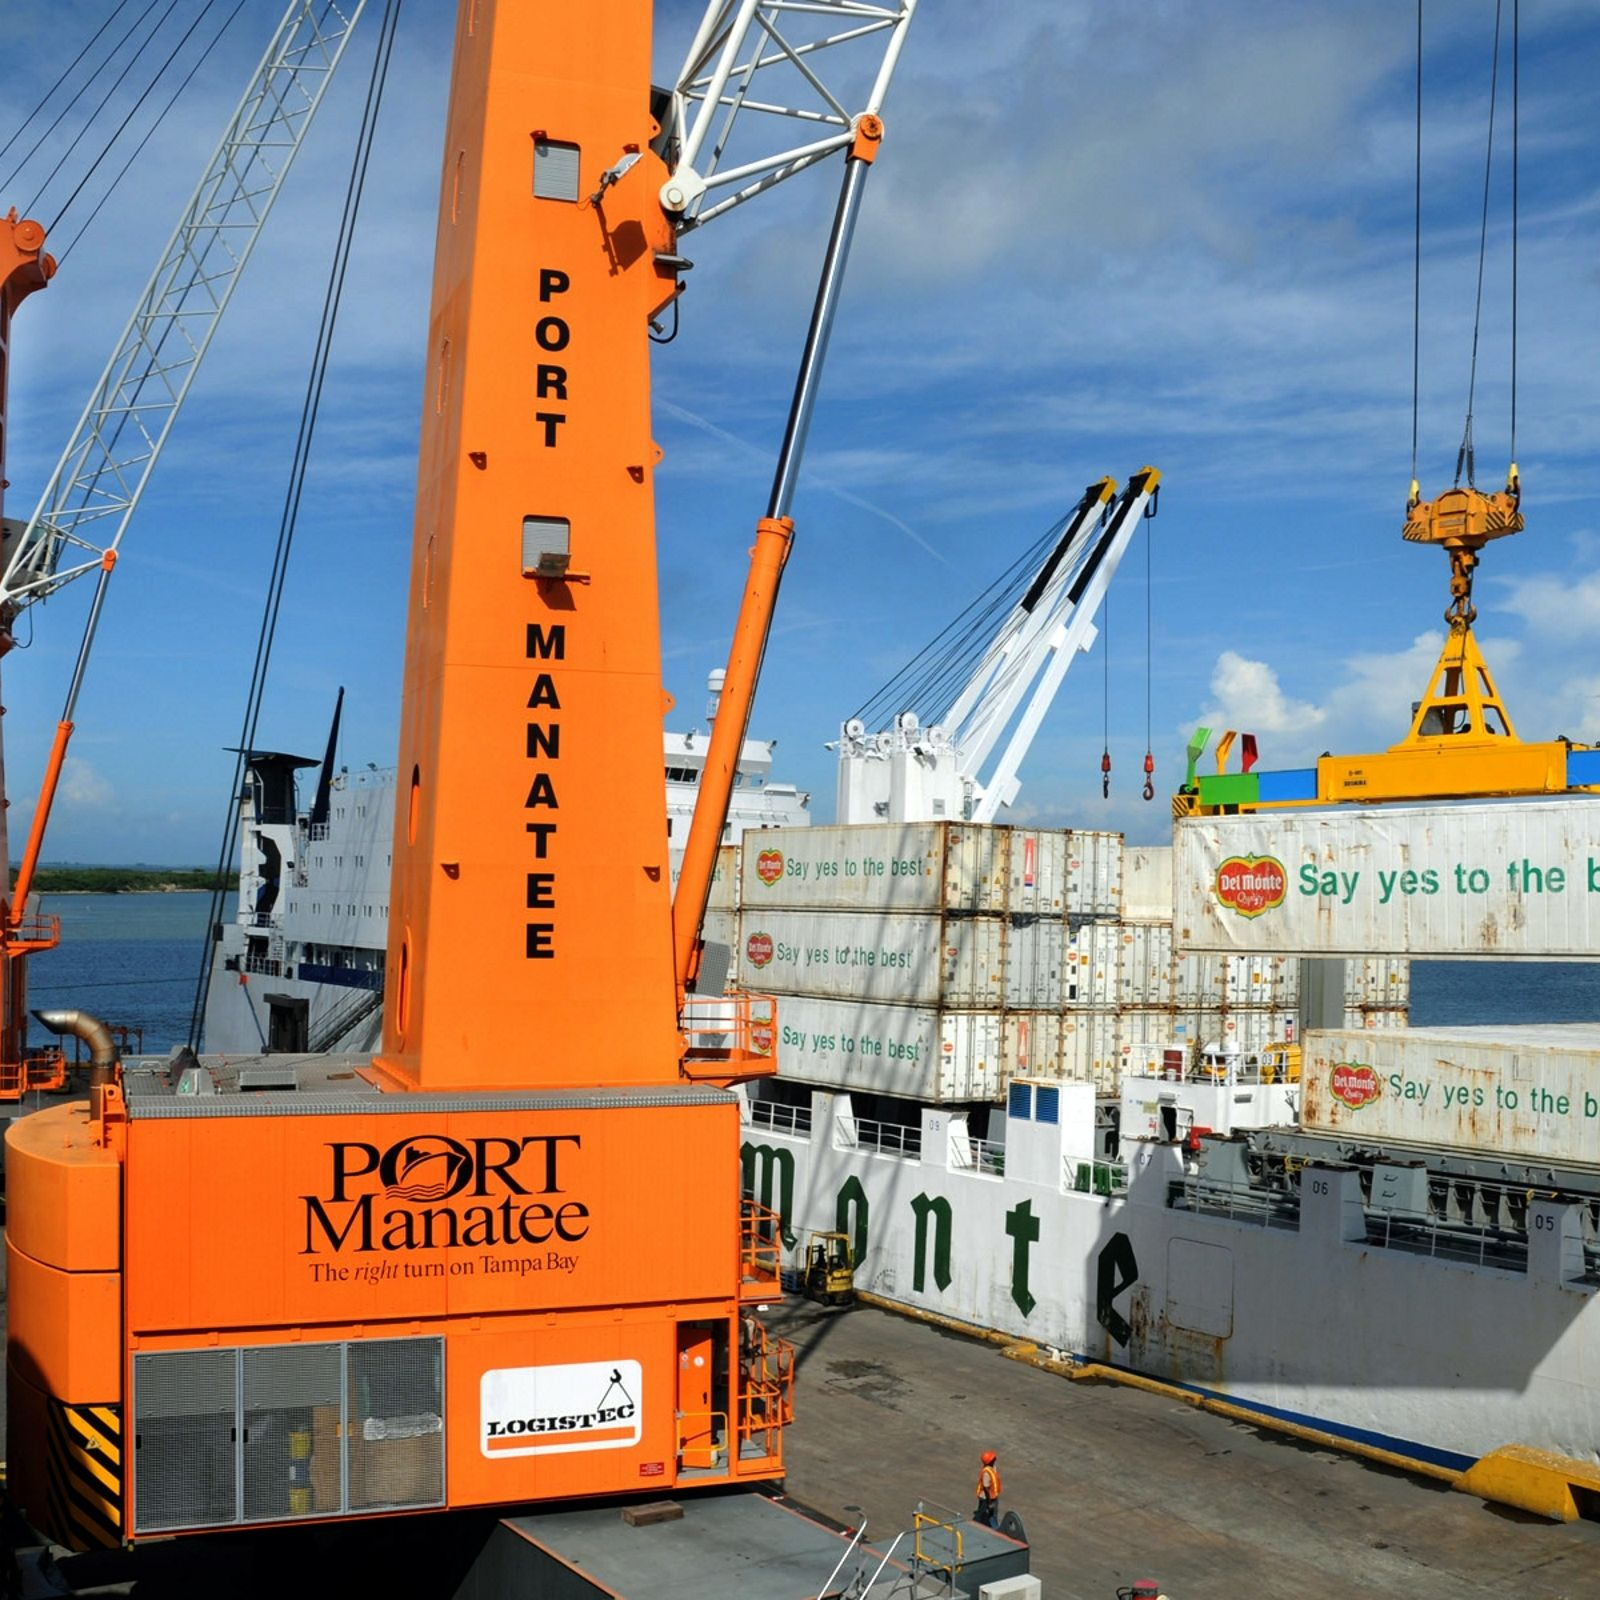 Port manatee bitau8